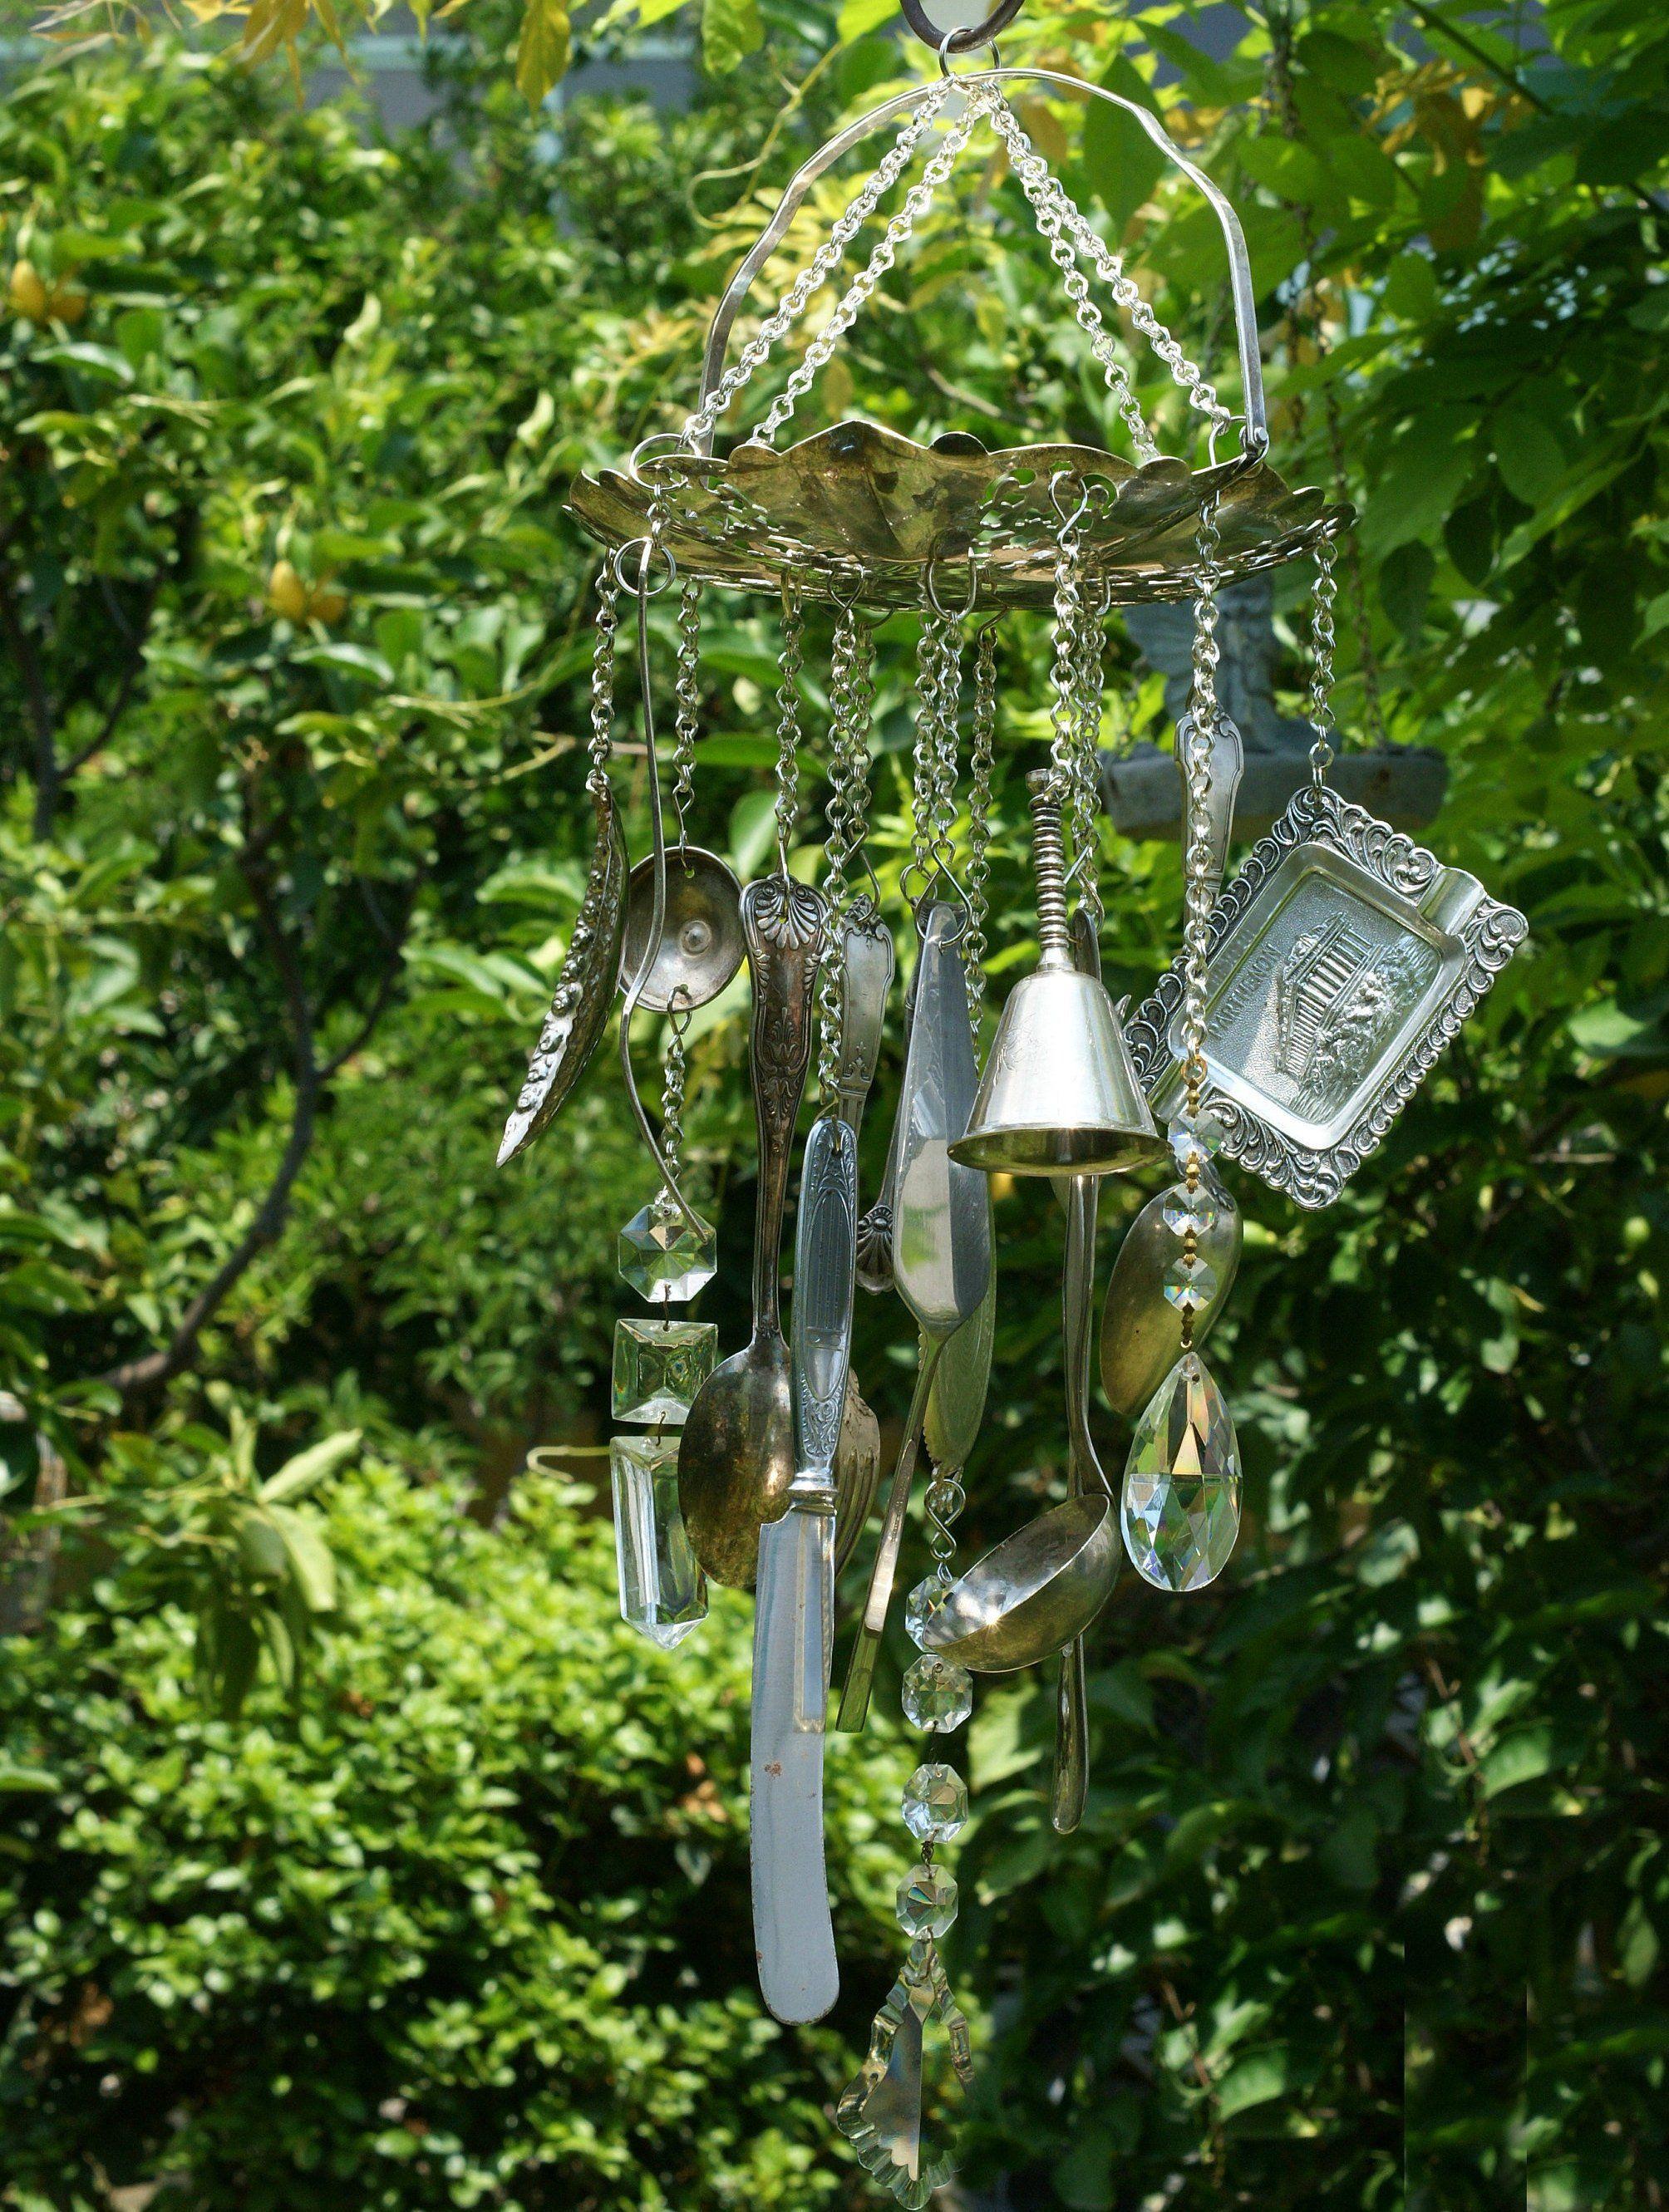 Sa wedding decor images  Wind Chime Repurposed Silverware Wind Chime Windchimes Garden